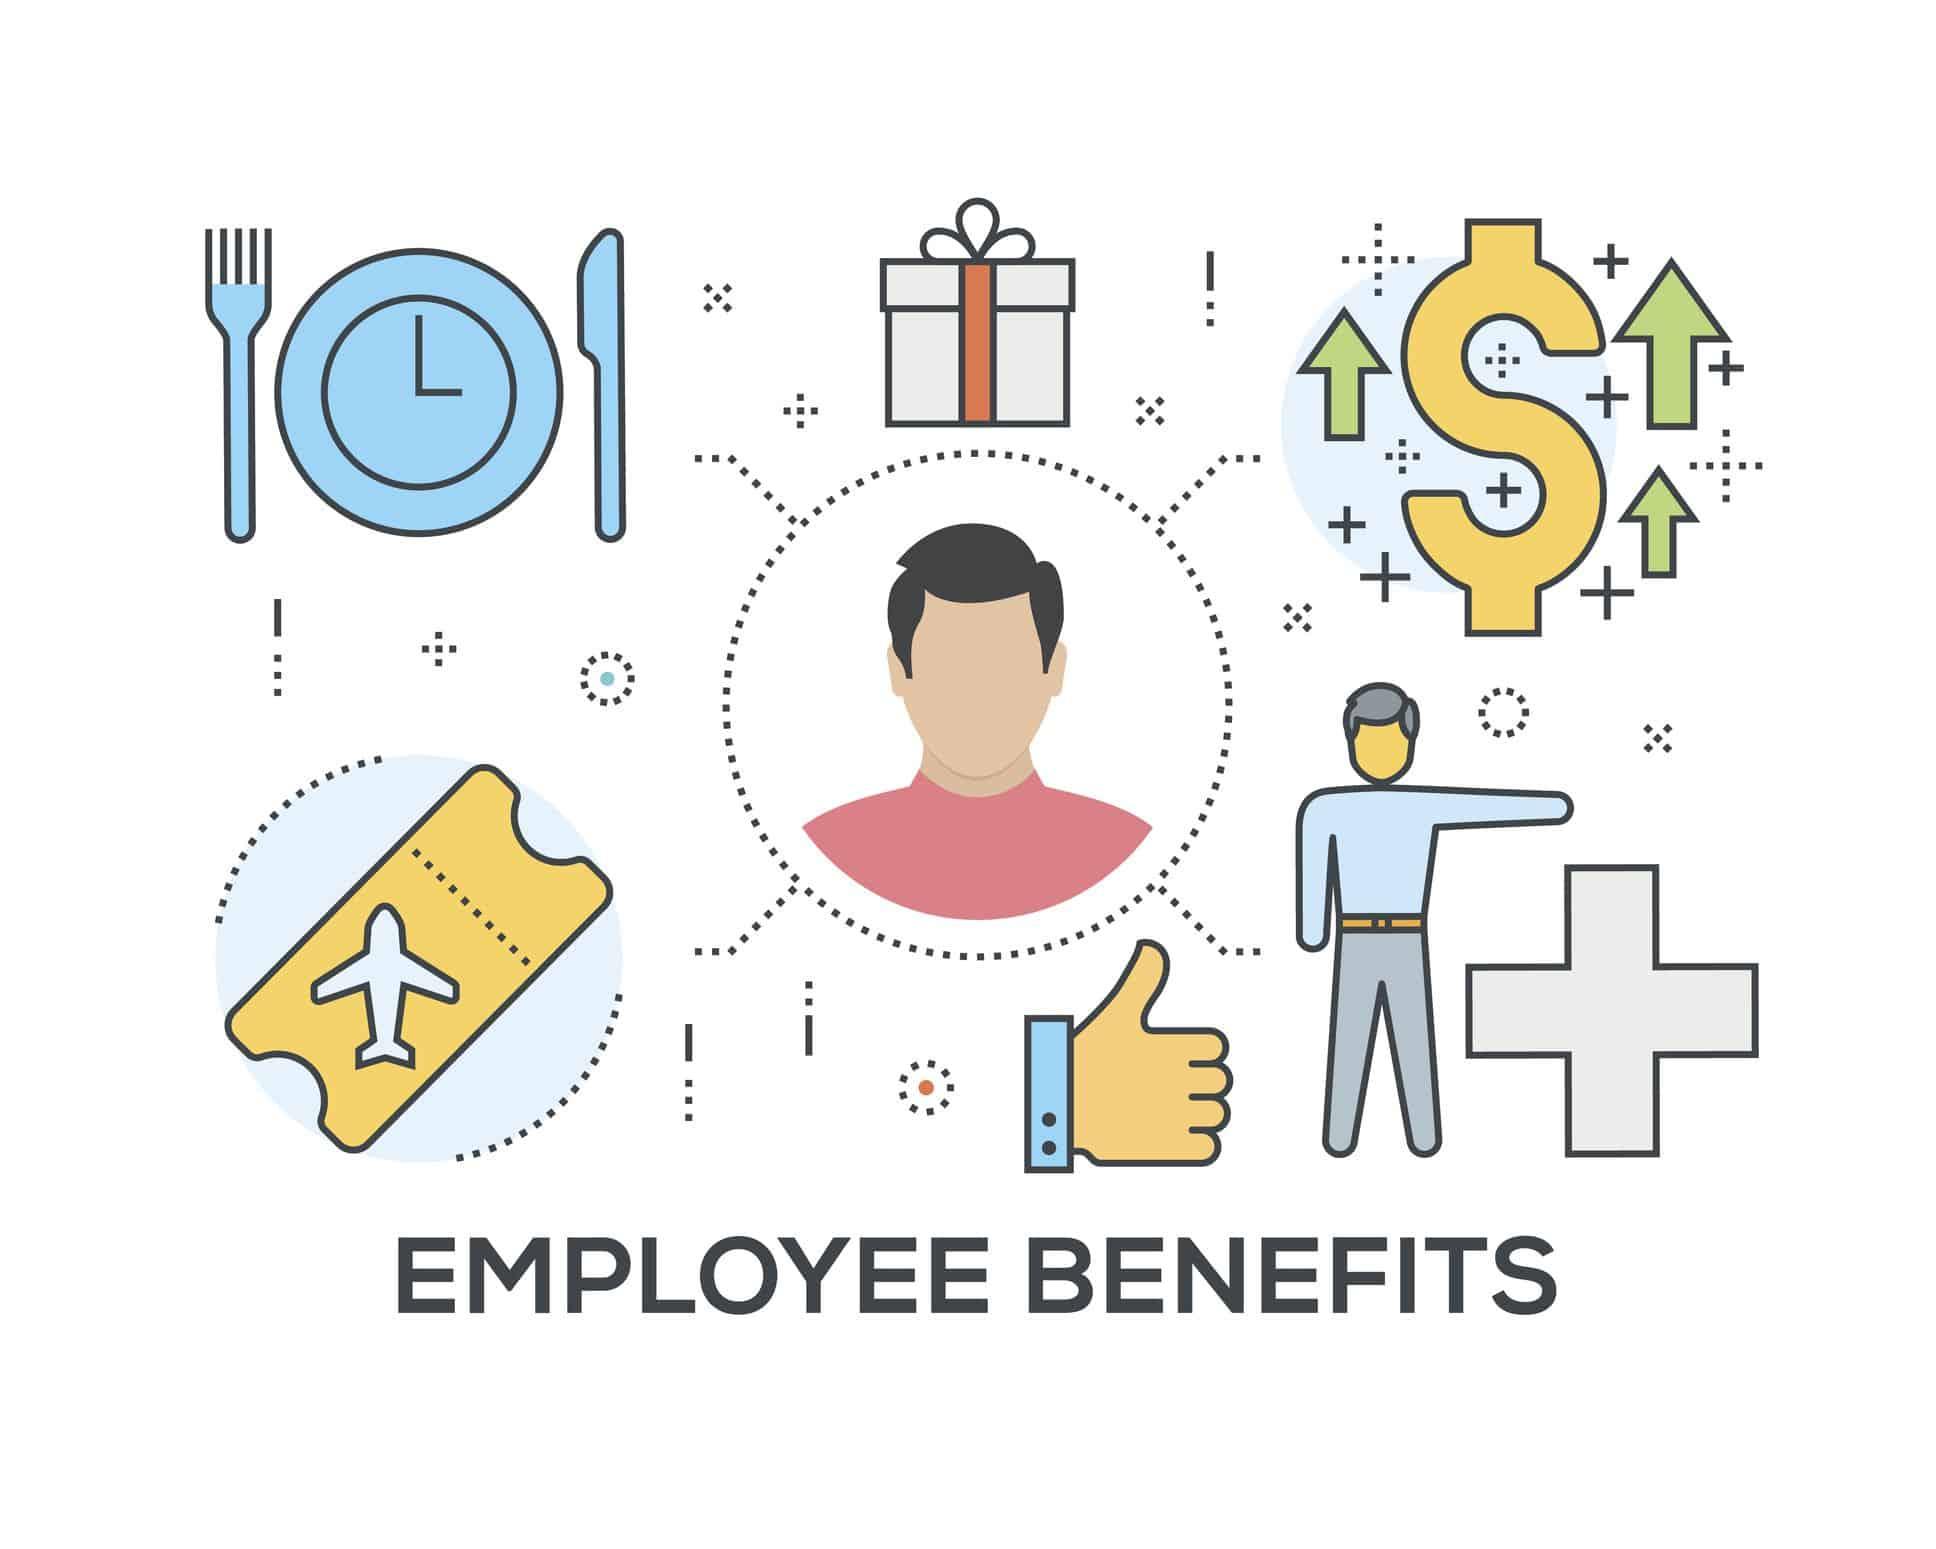 UpserLogin - Employee Benefits